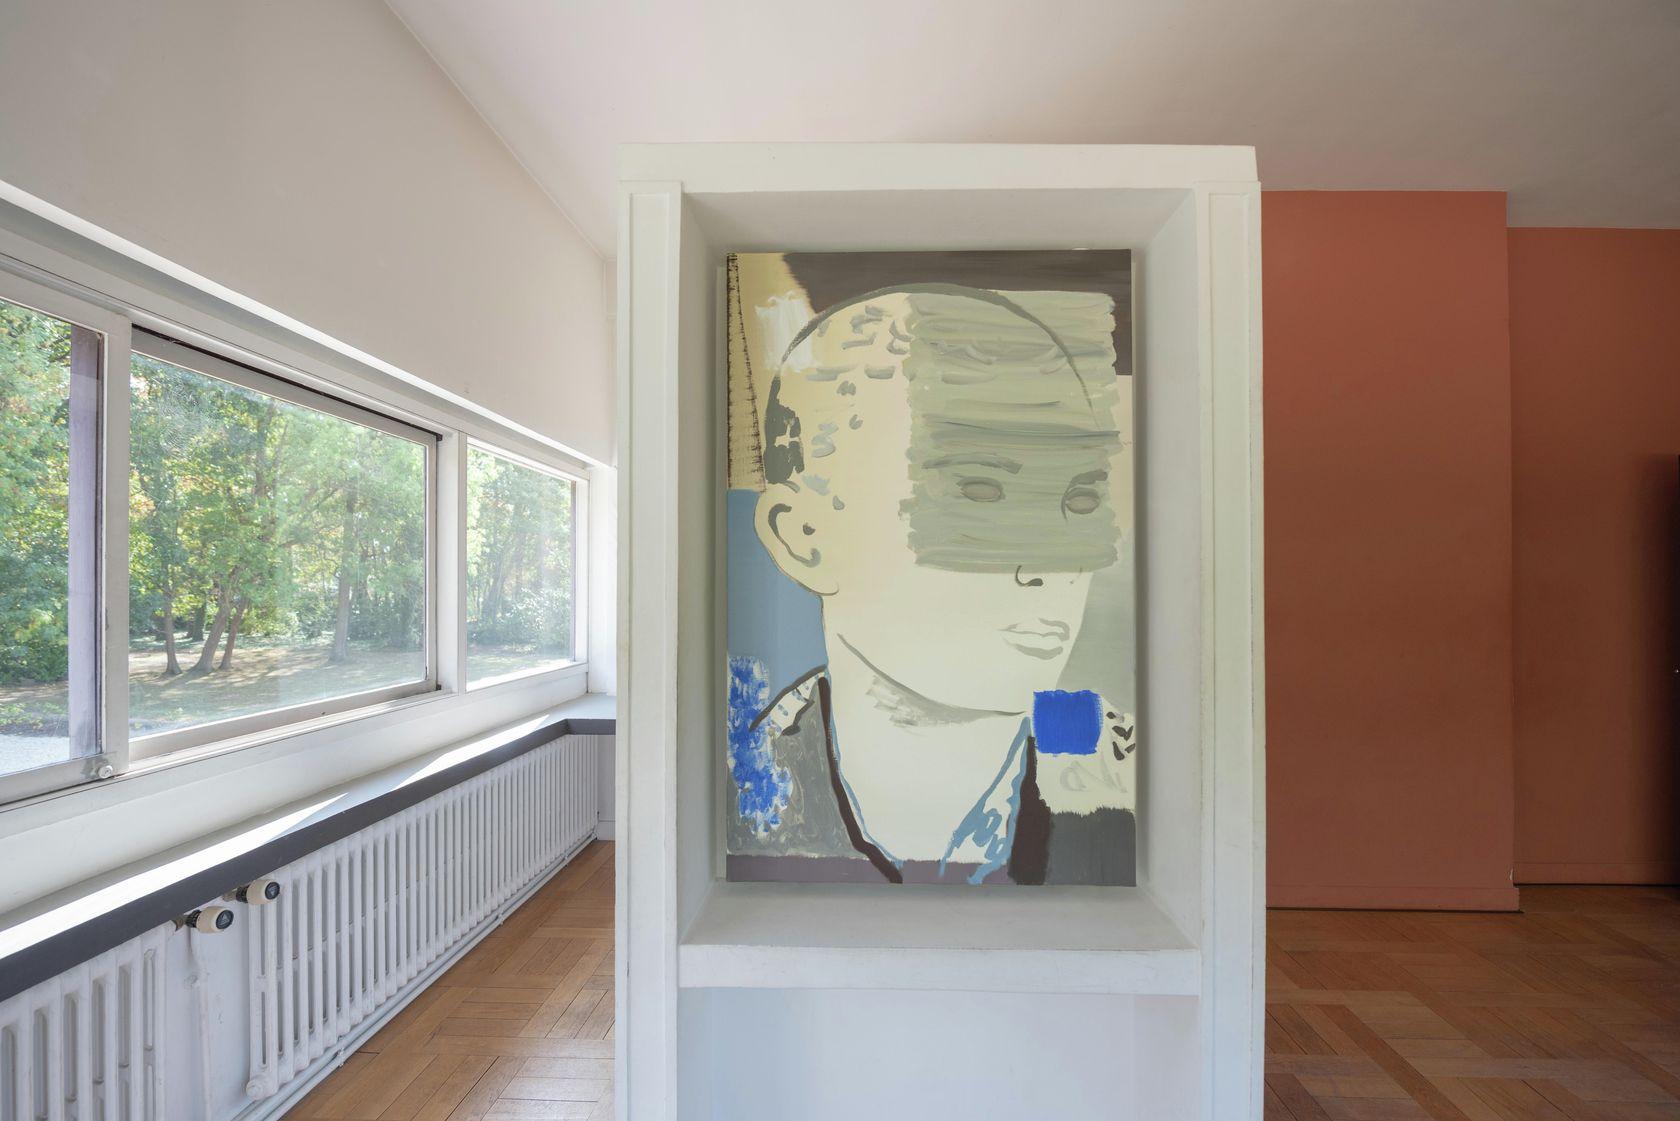 Françoise Pétrovitch, Adolescent, 2019 Habiter la Villa, Villa Savoye, Poissy (FR) 18 septembre 2020 - 24 janvier 2021 © Hervé Plumet